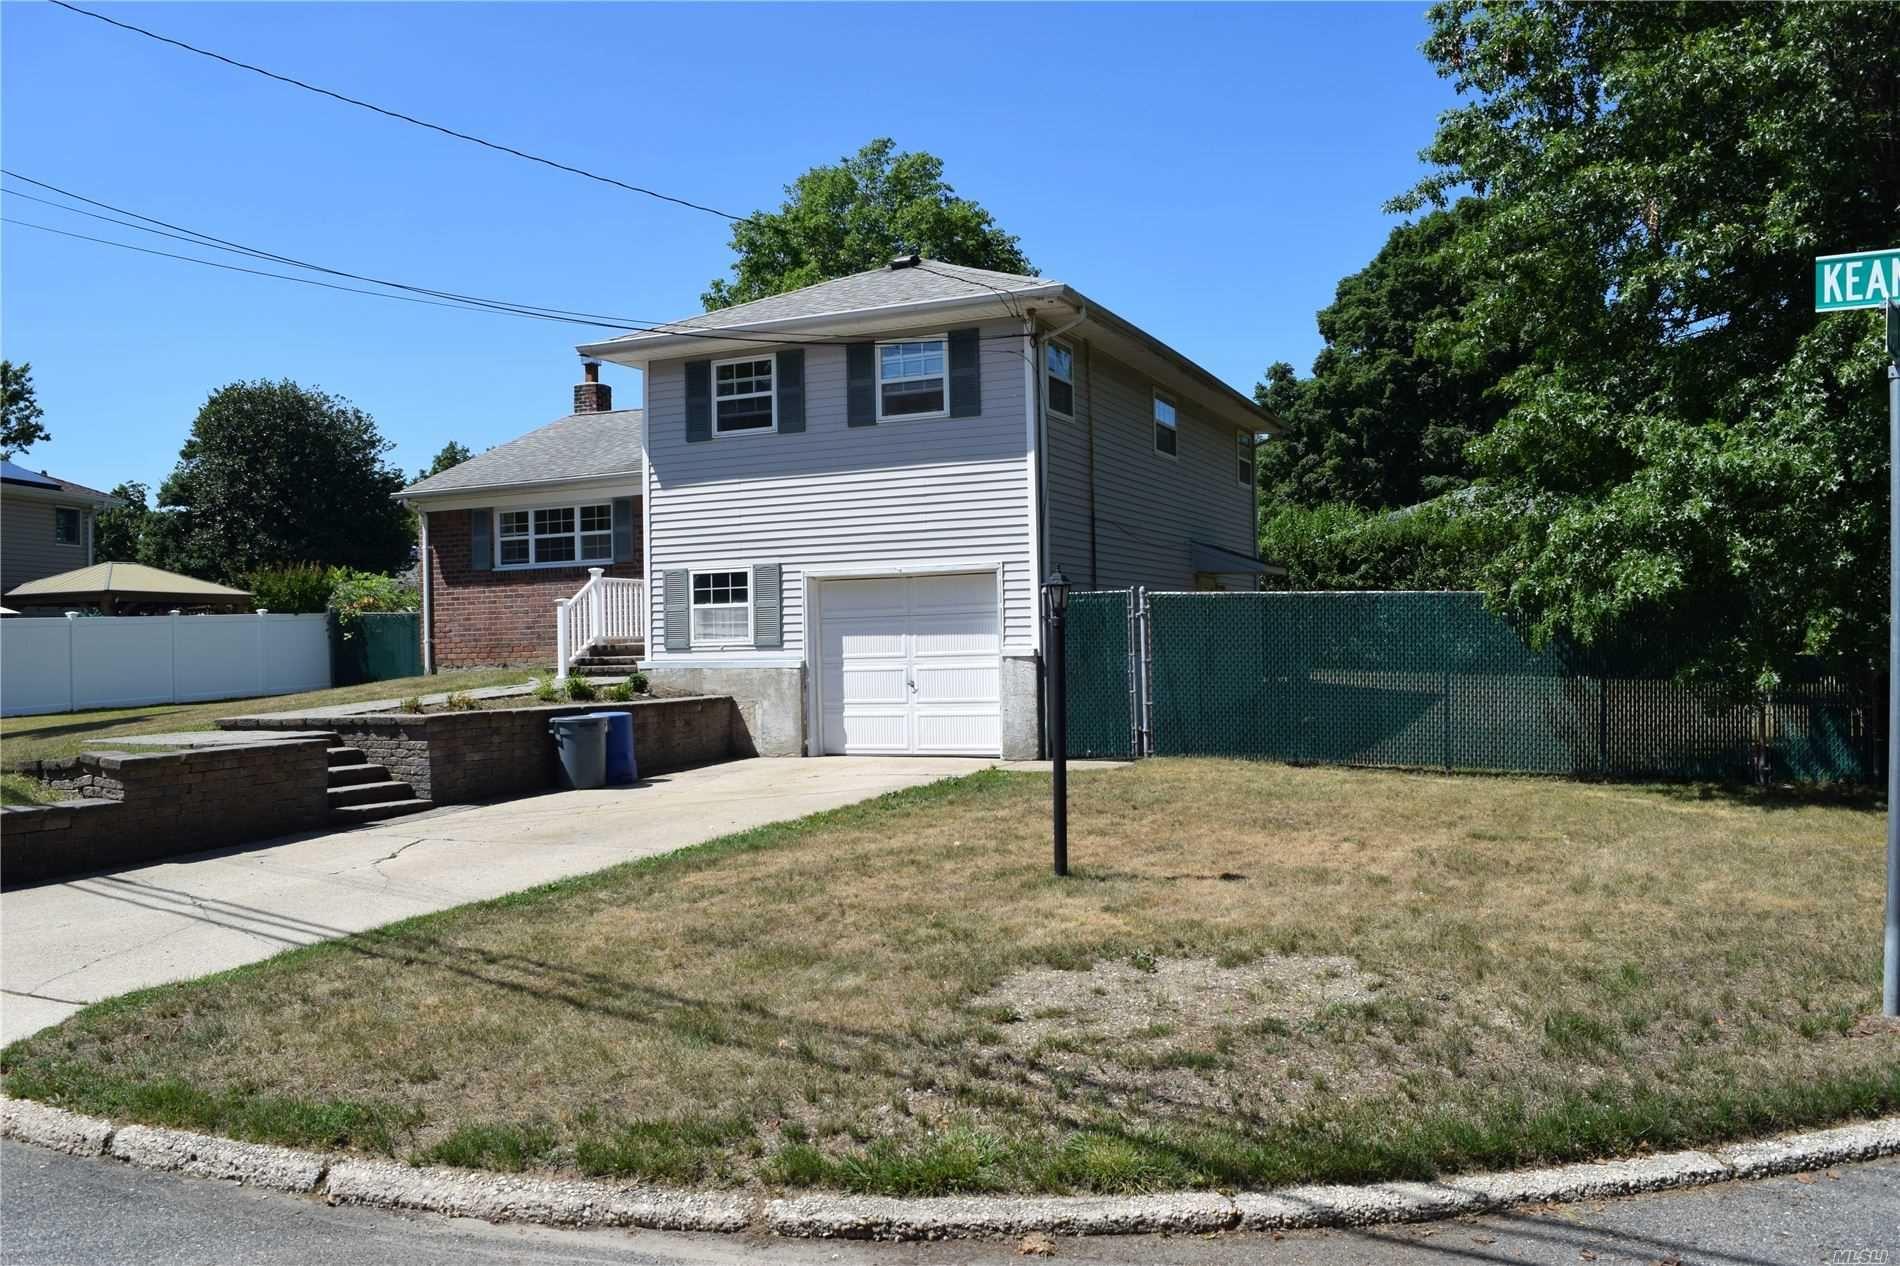 76 Keane Lane, East Northport, NY 11731 - MLS#: 3234989